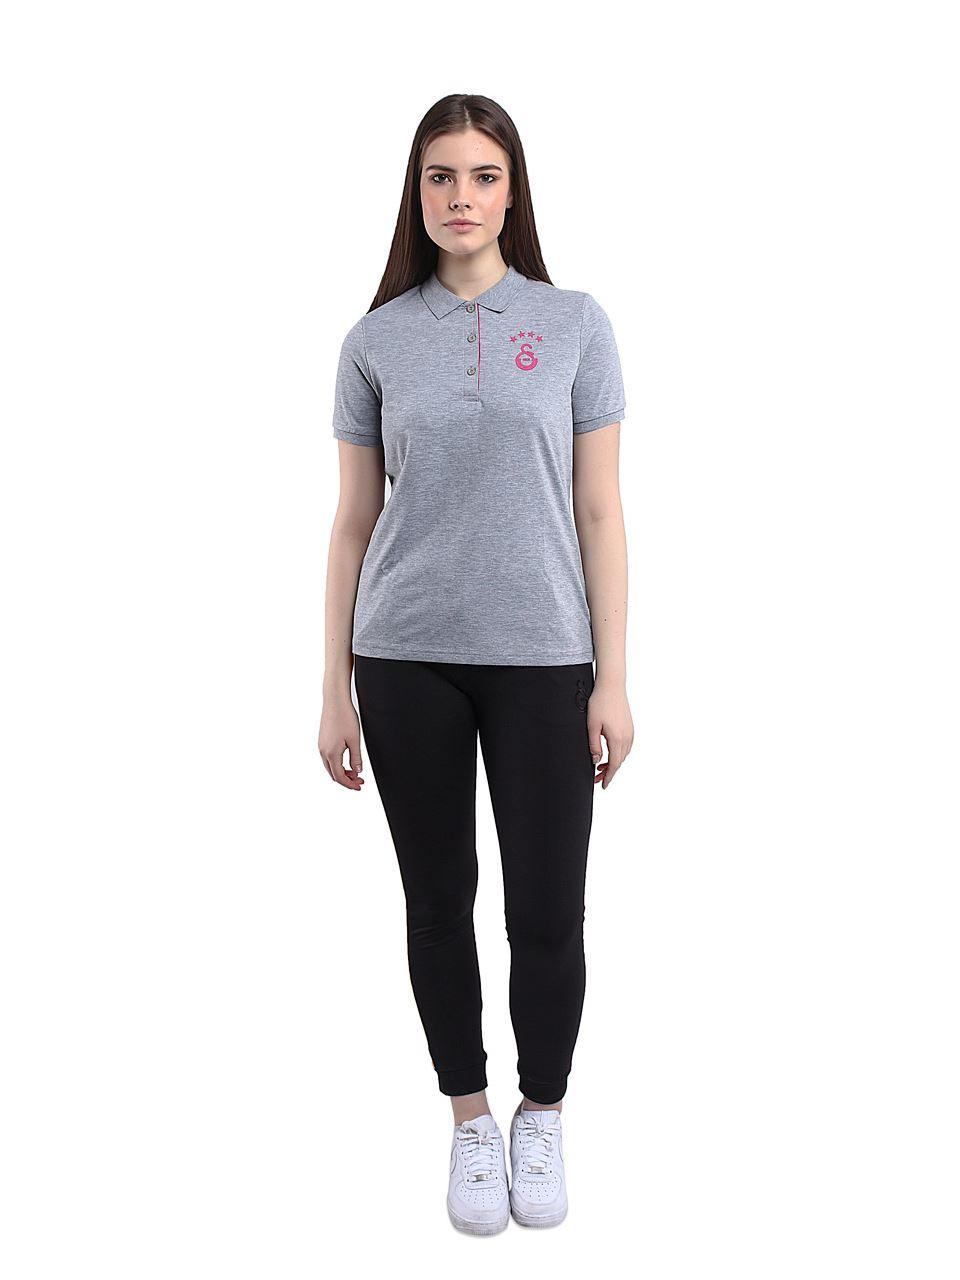 K90118 Polo T-shirt